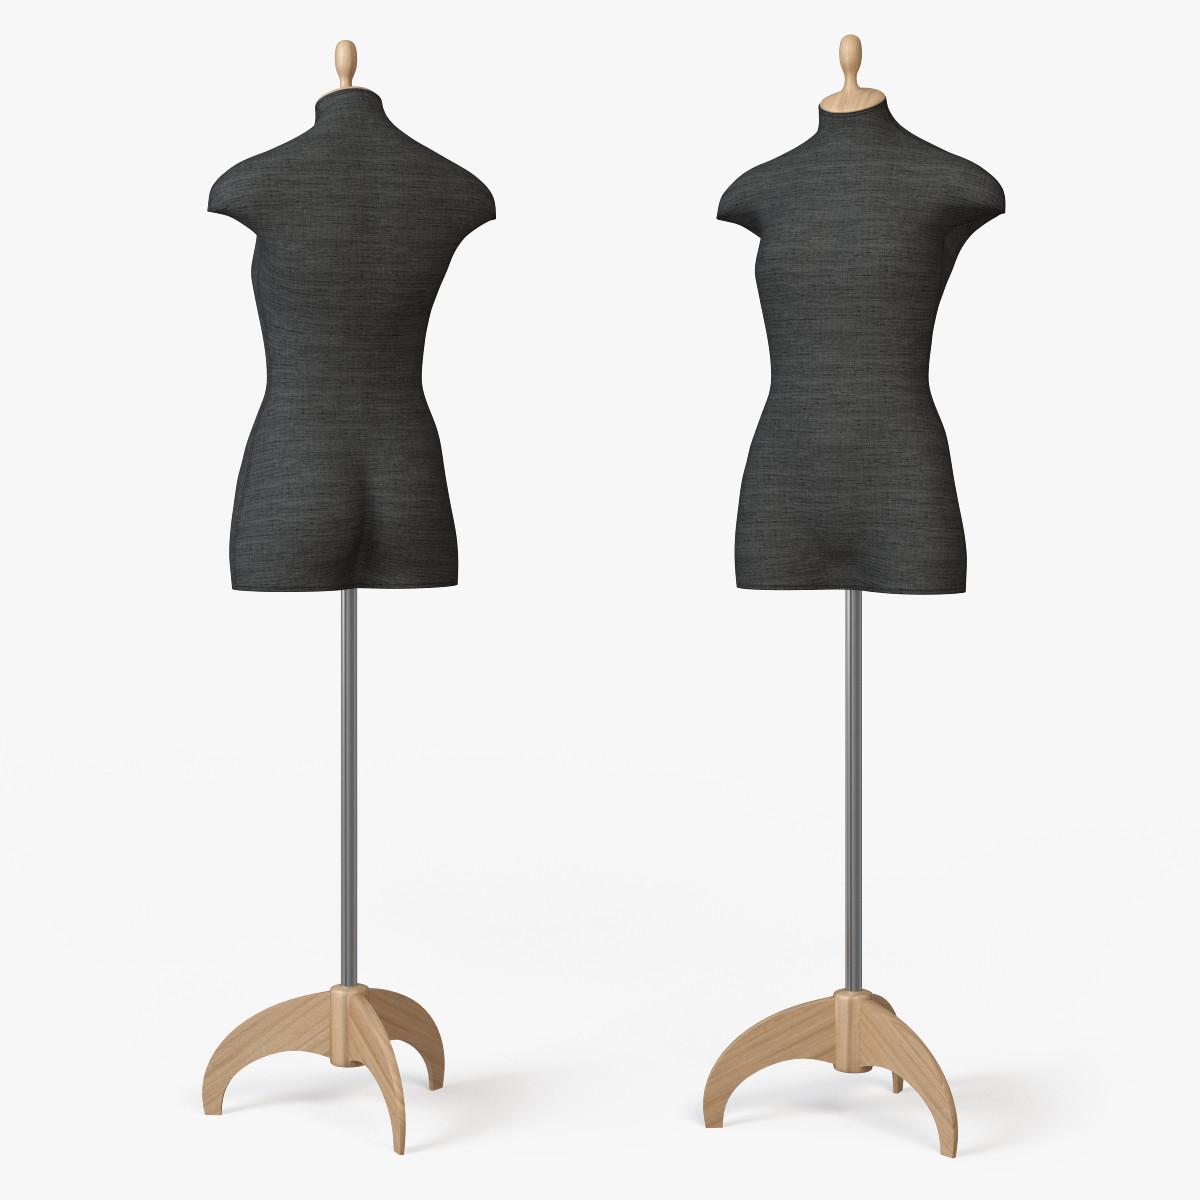 tailors'_dummies_01.jpg